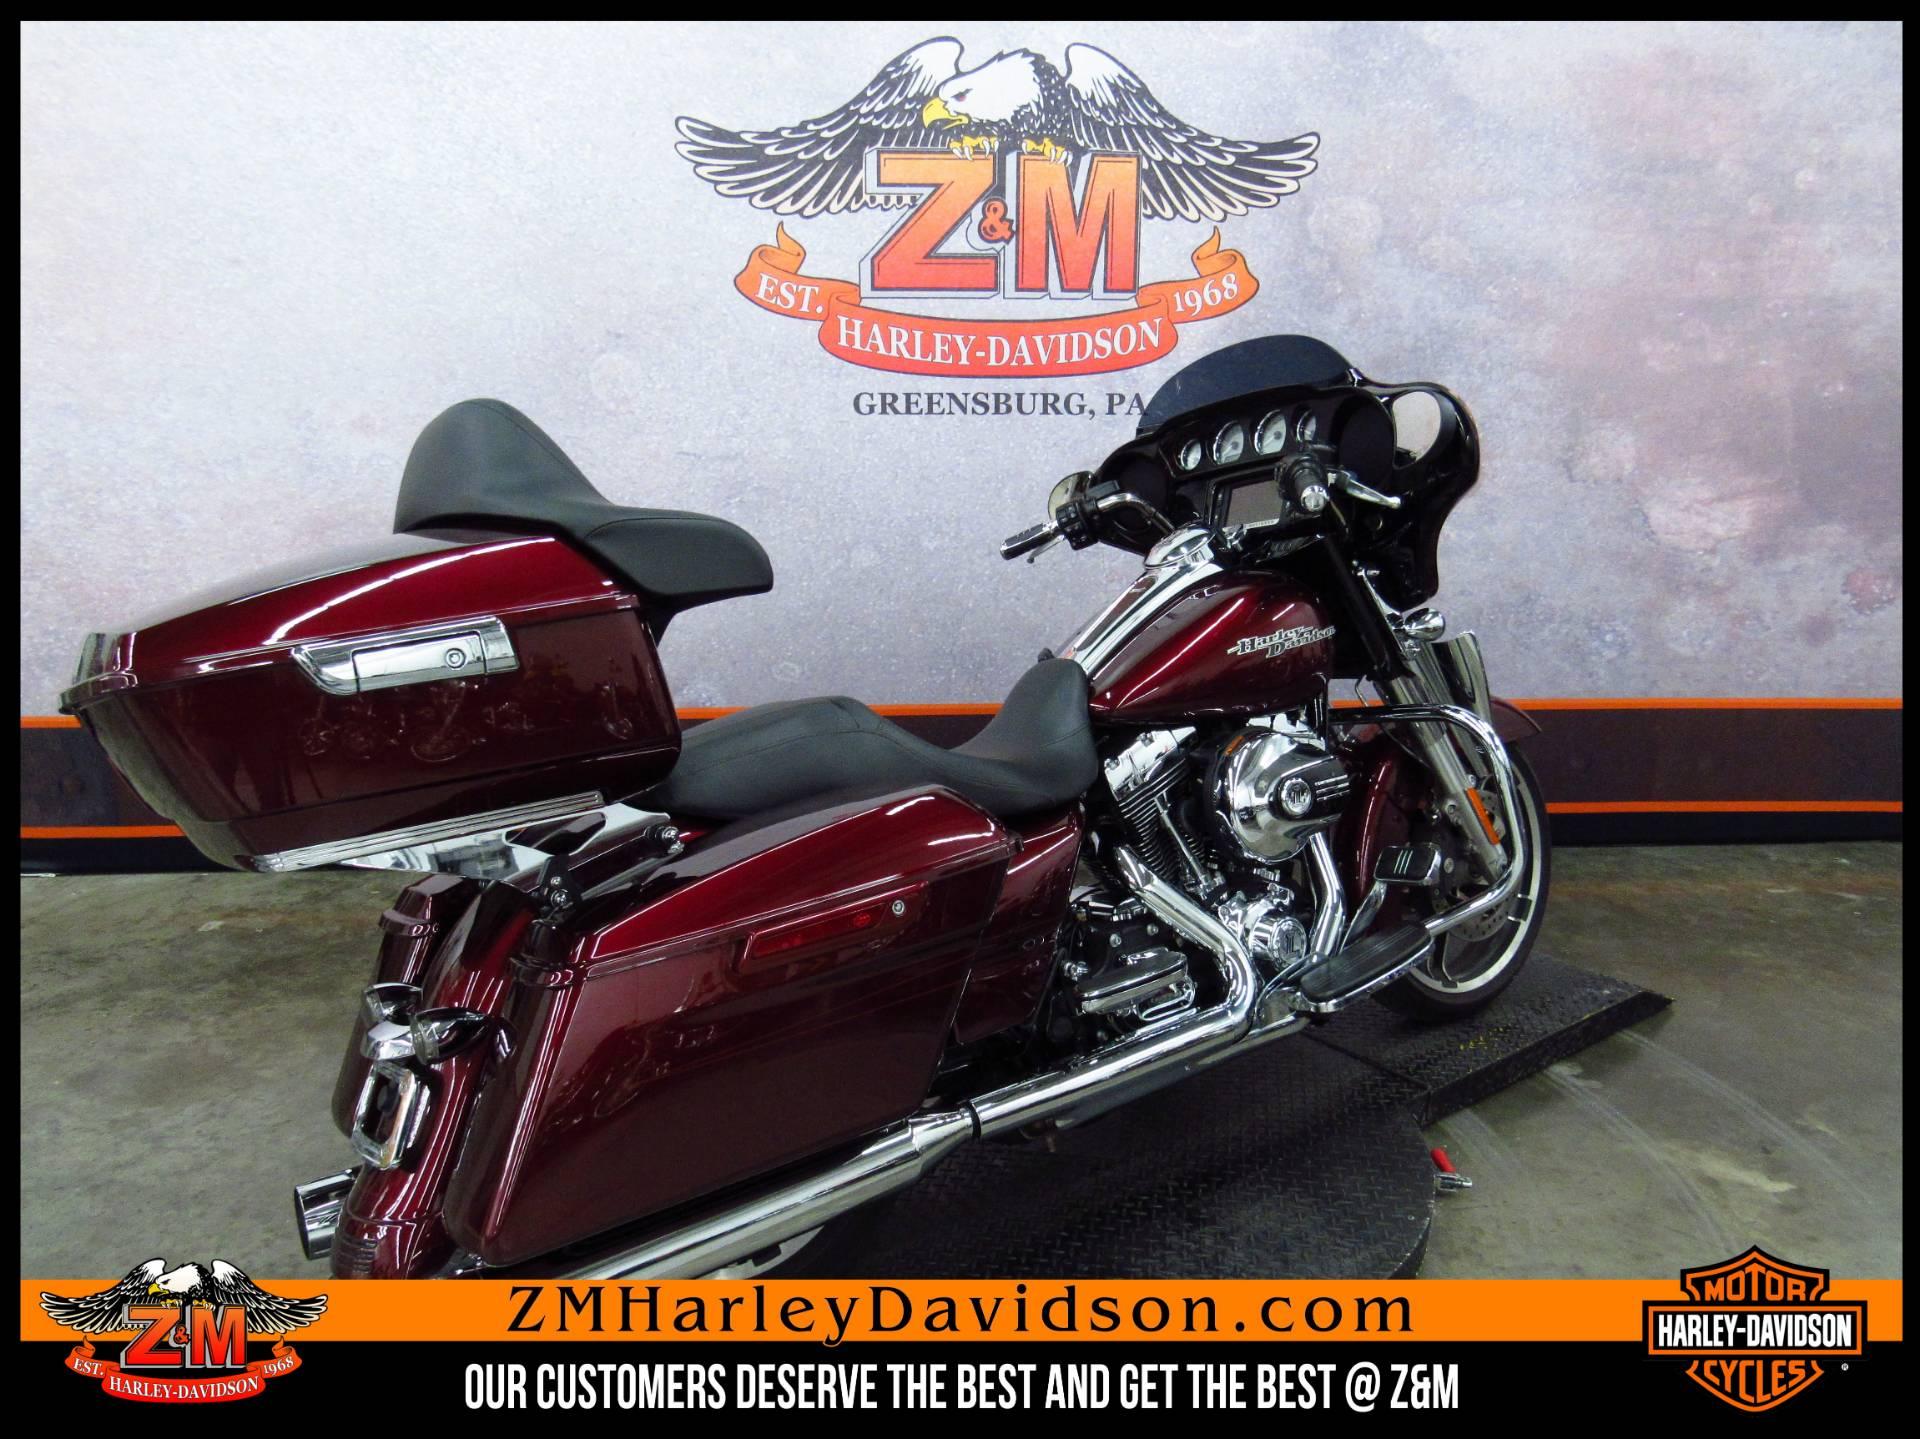 2014 Harley-Davidson Street Glide Special 3